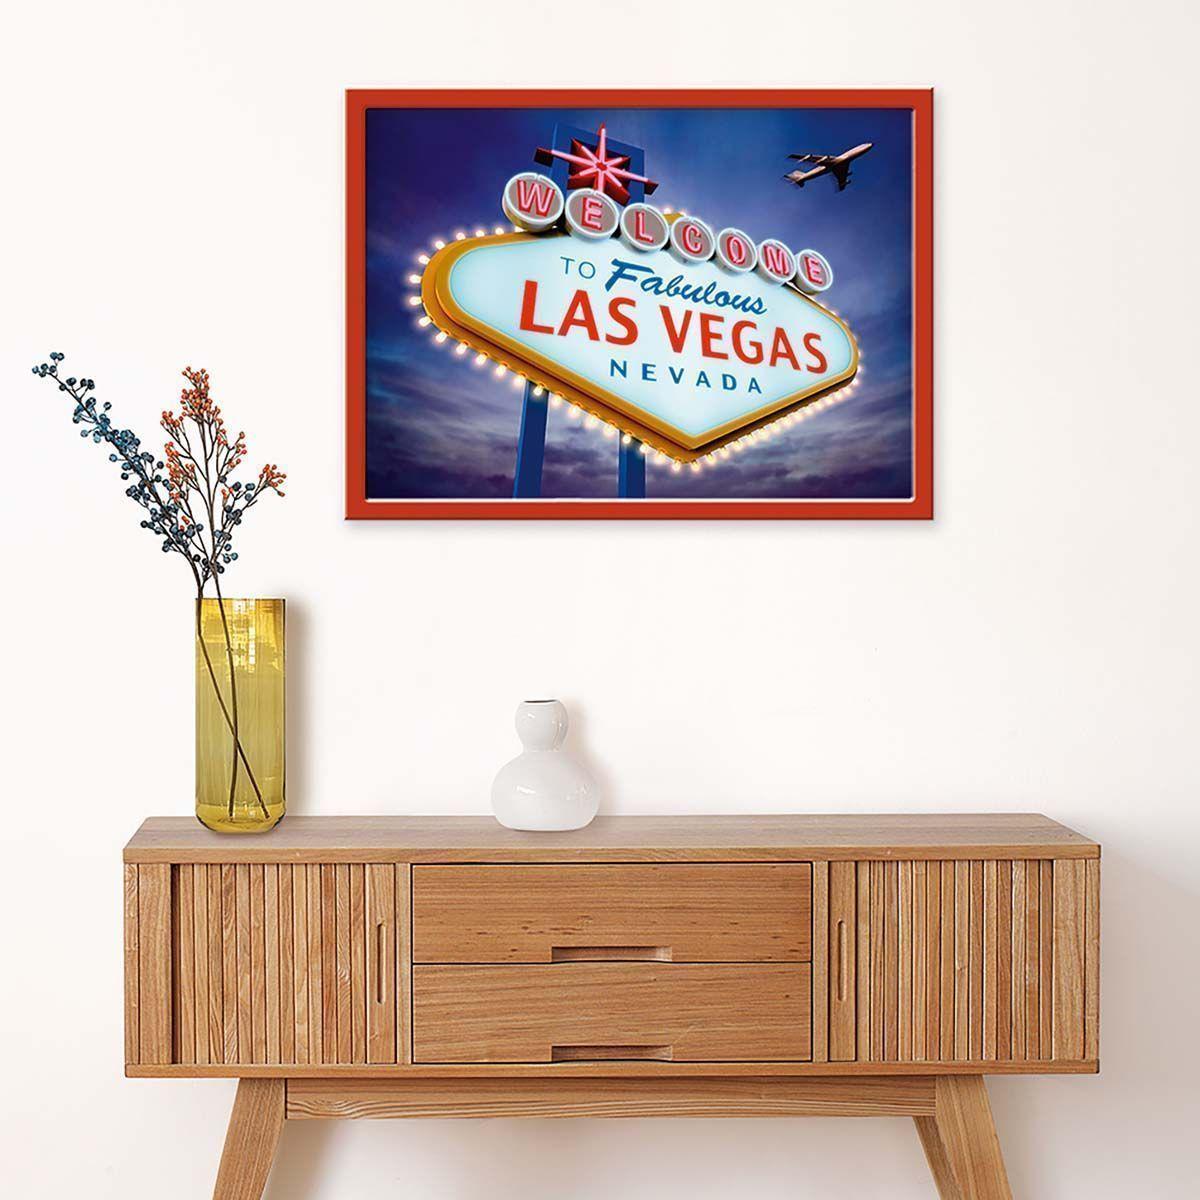 Affiche-Welcome-to-Las-Vegas-50x70-cm miniature 2